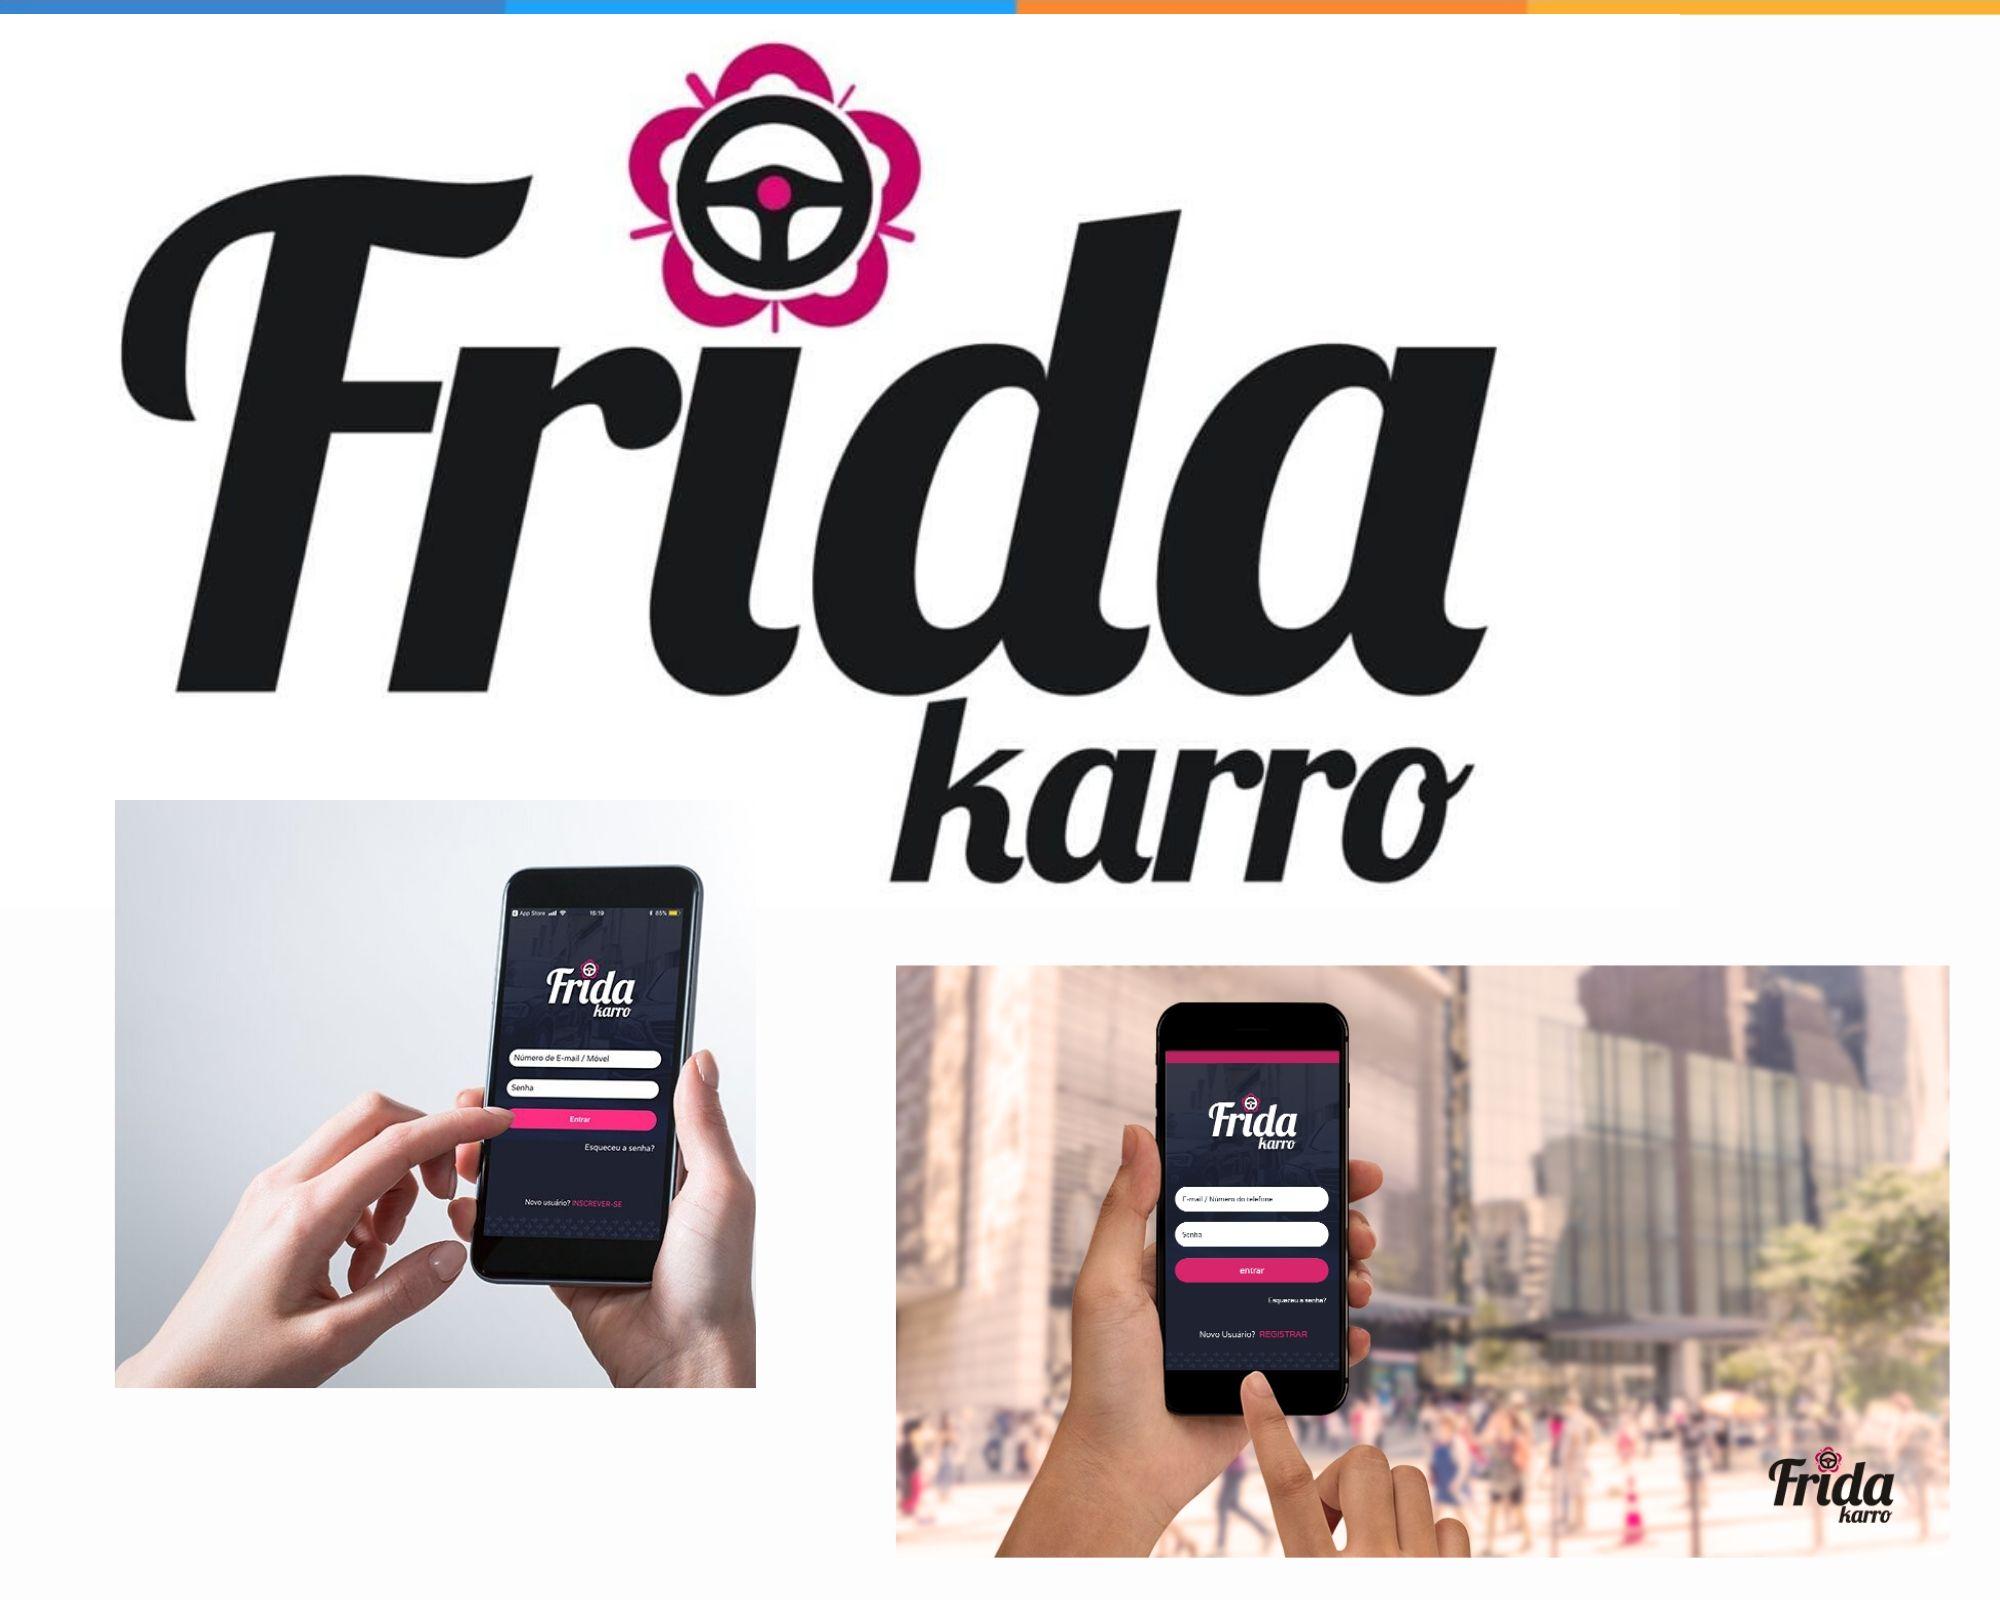 Frida Karro!